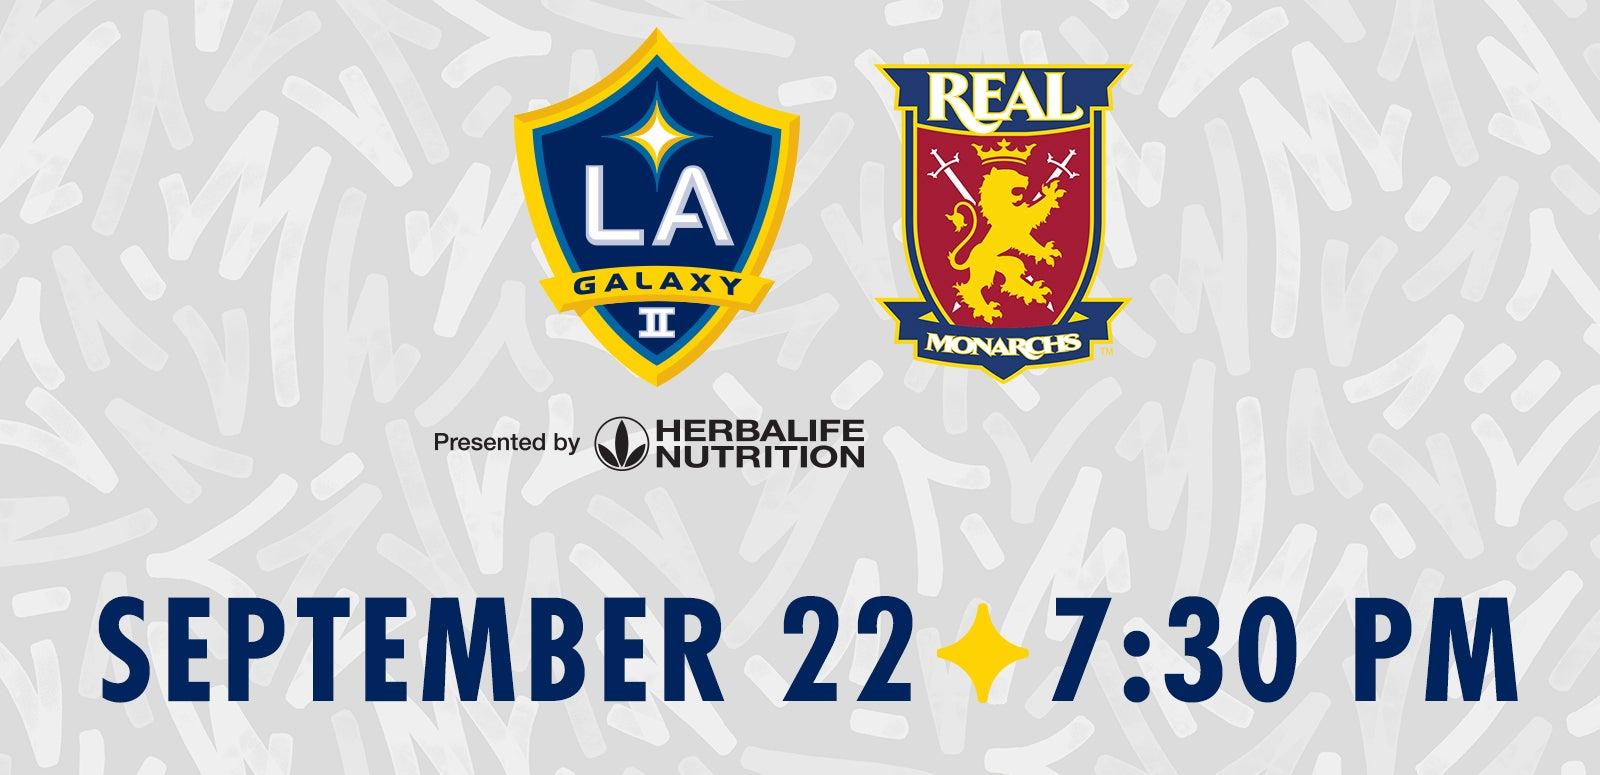 LA Galaxy II vs. Real Monarchs SLC